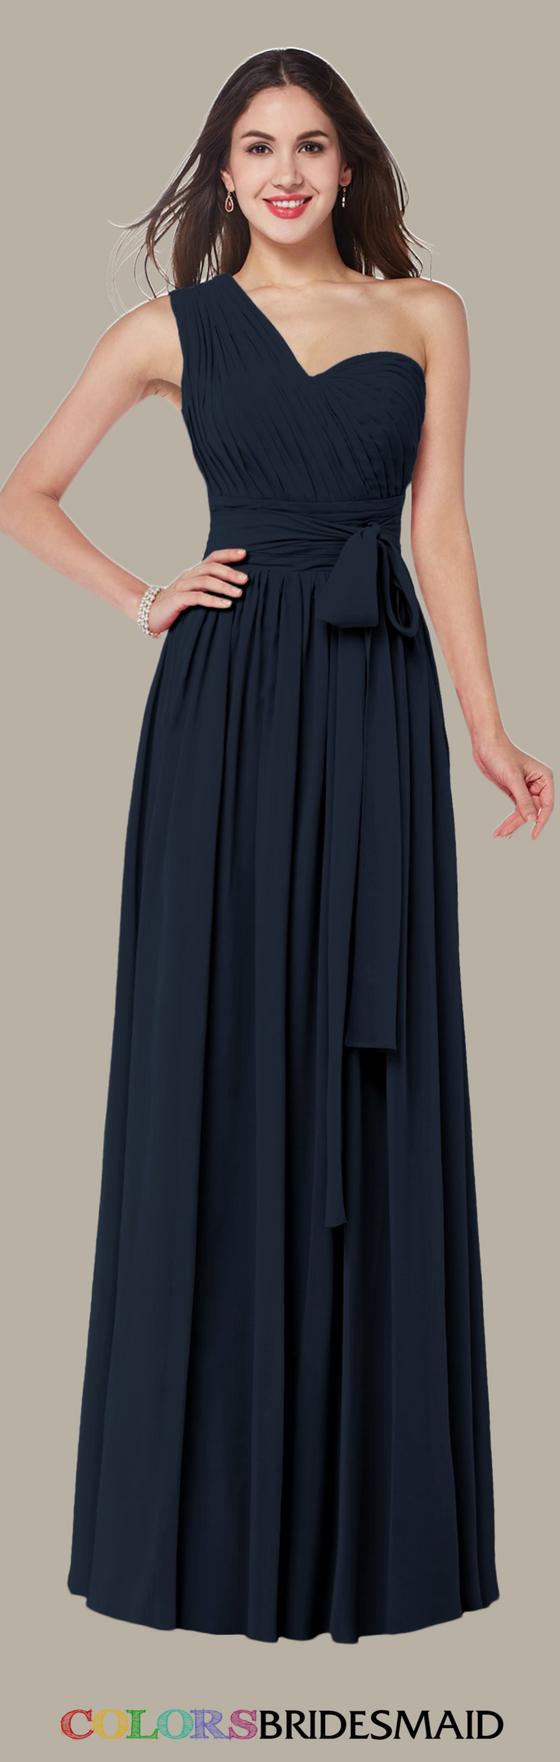 Colsbm emmeline navy blue color long bridesmaid dresses and